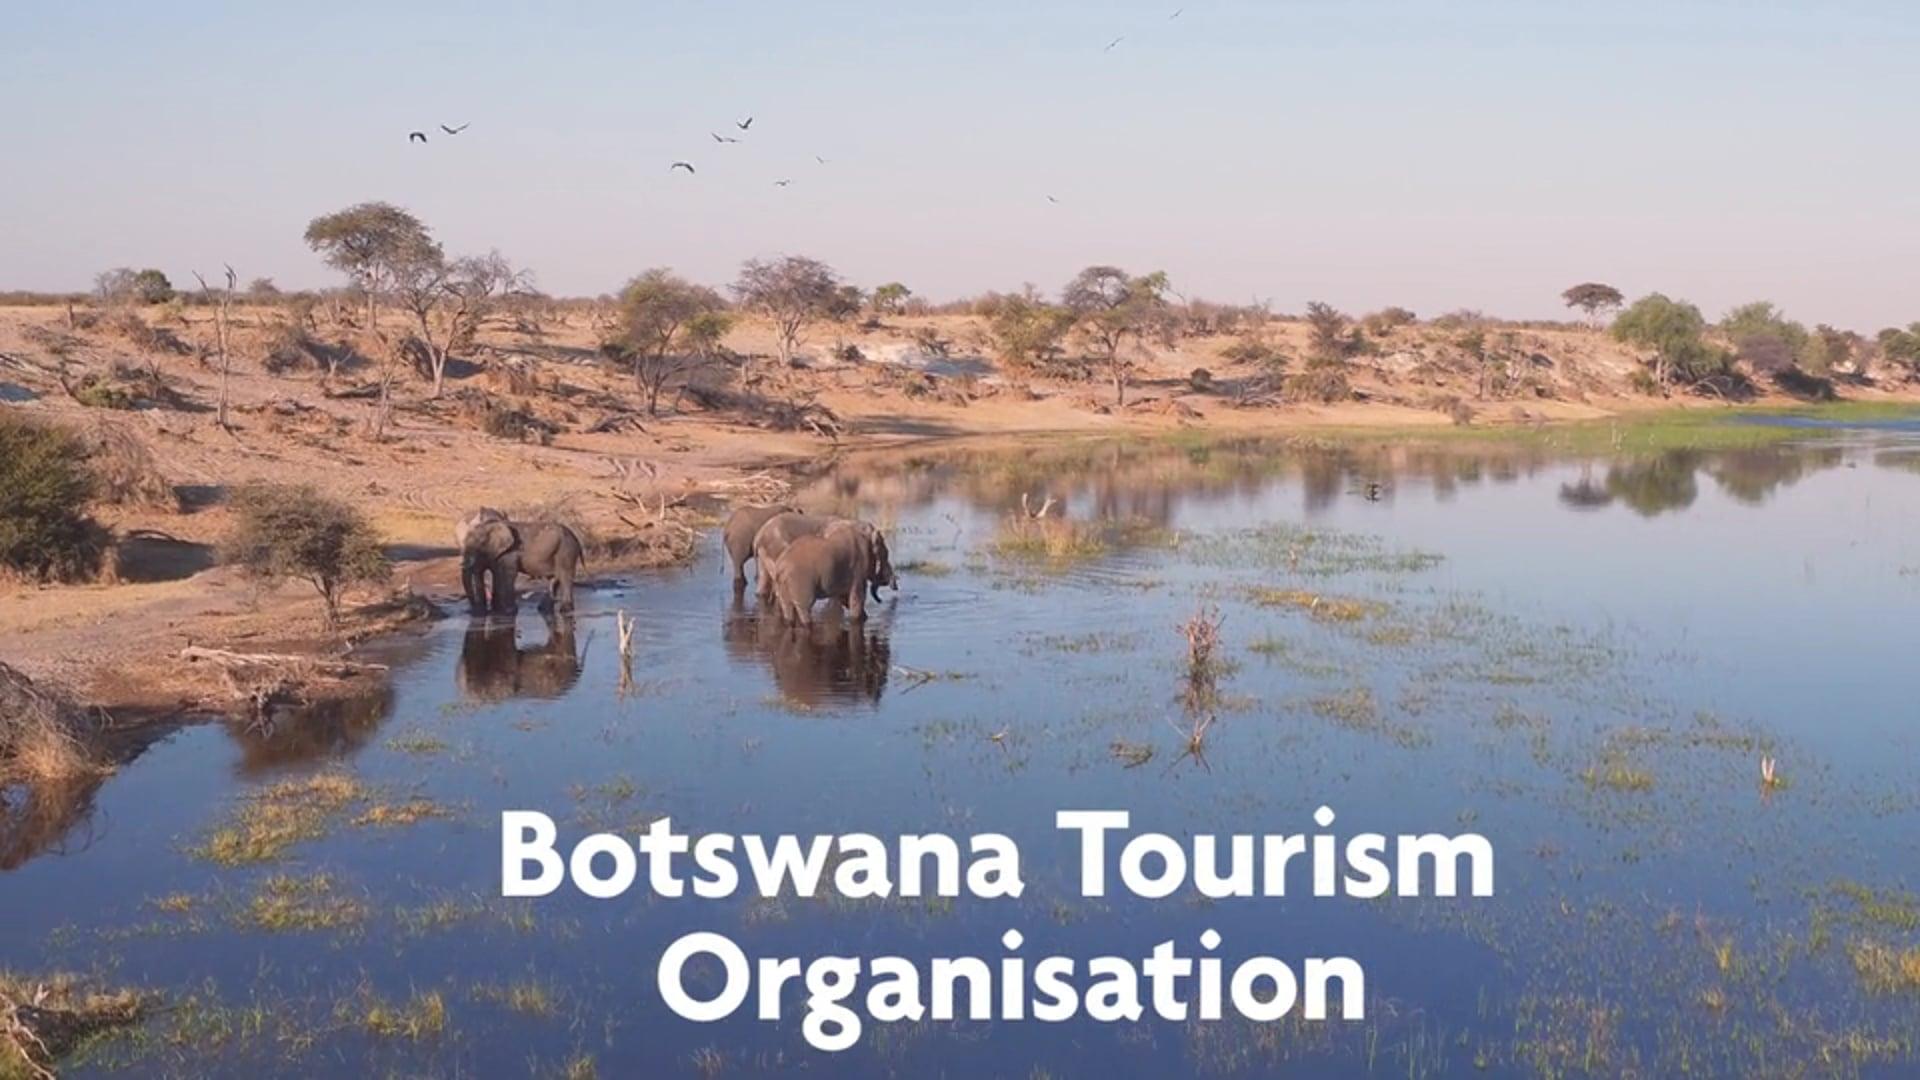 Botswana Tourism Organisation